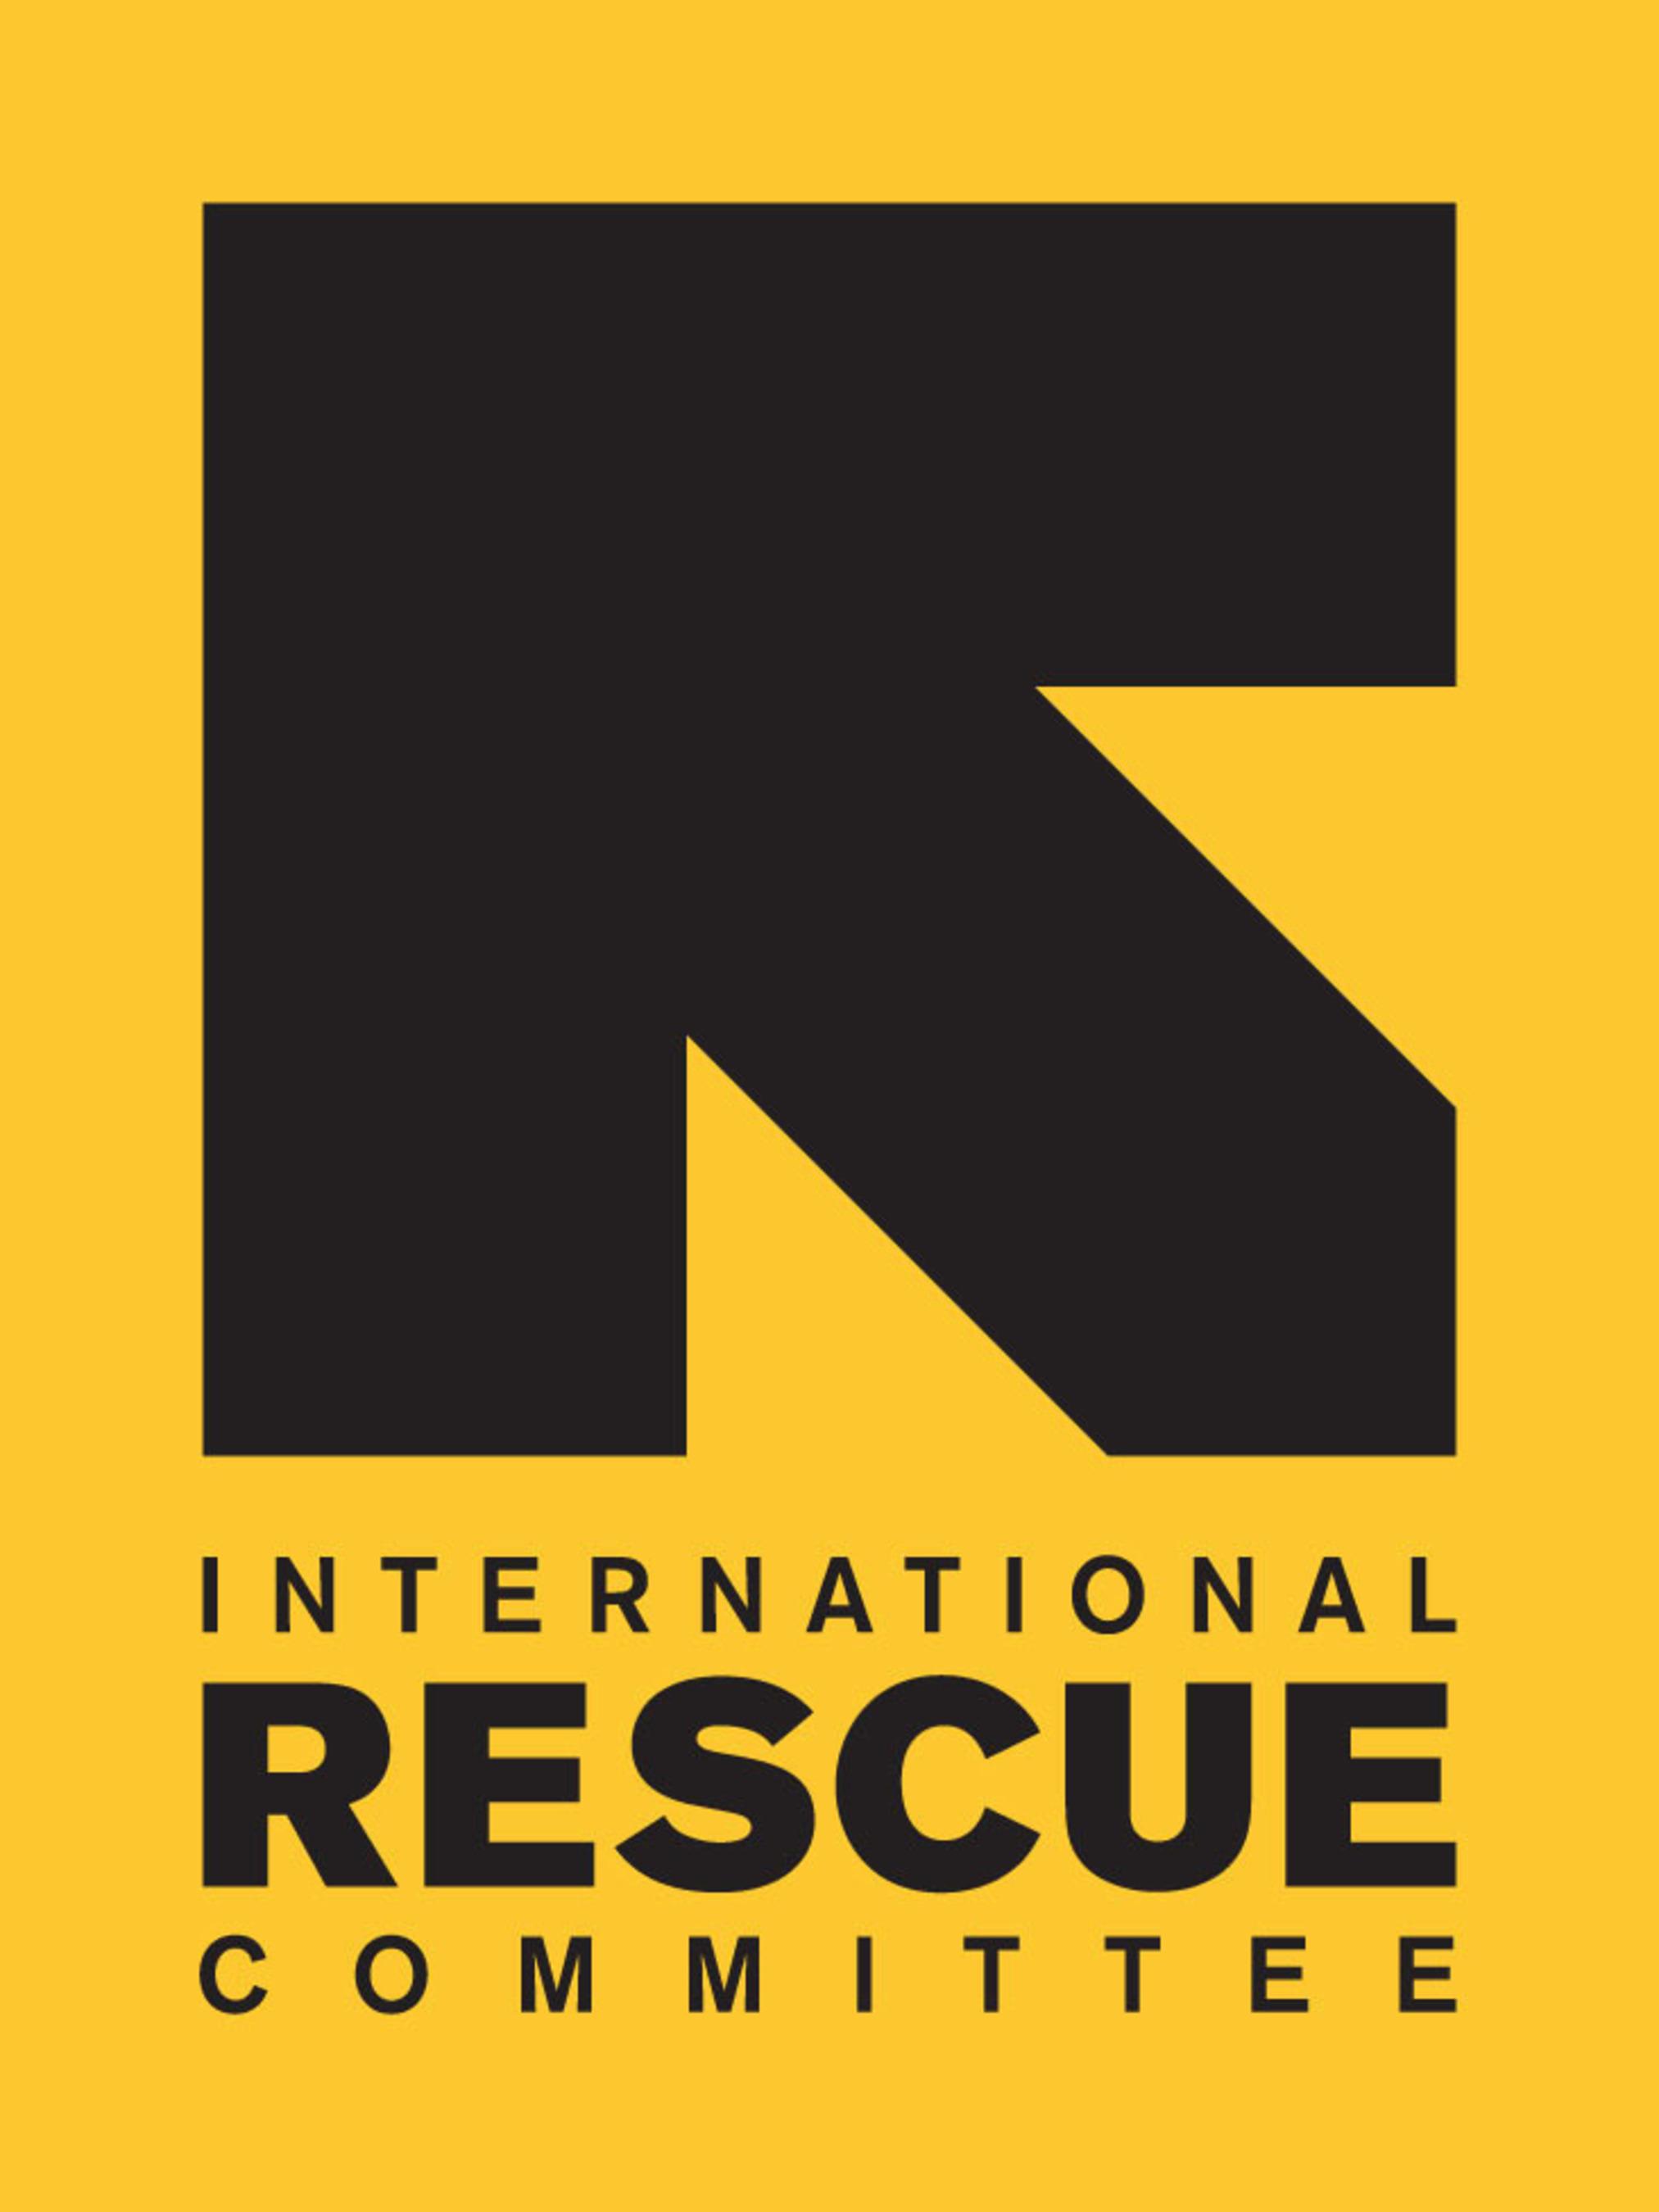 International Rescue Committee. (PRNewsFoto/International Rescue Committee) (PRNewsFoto/)